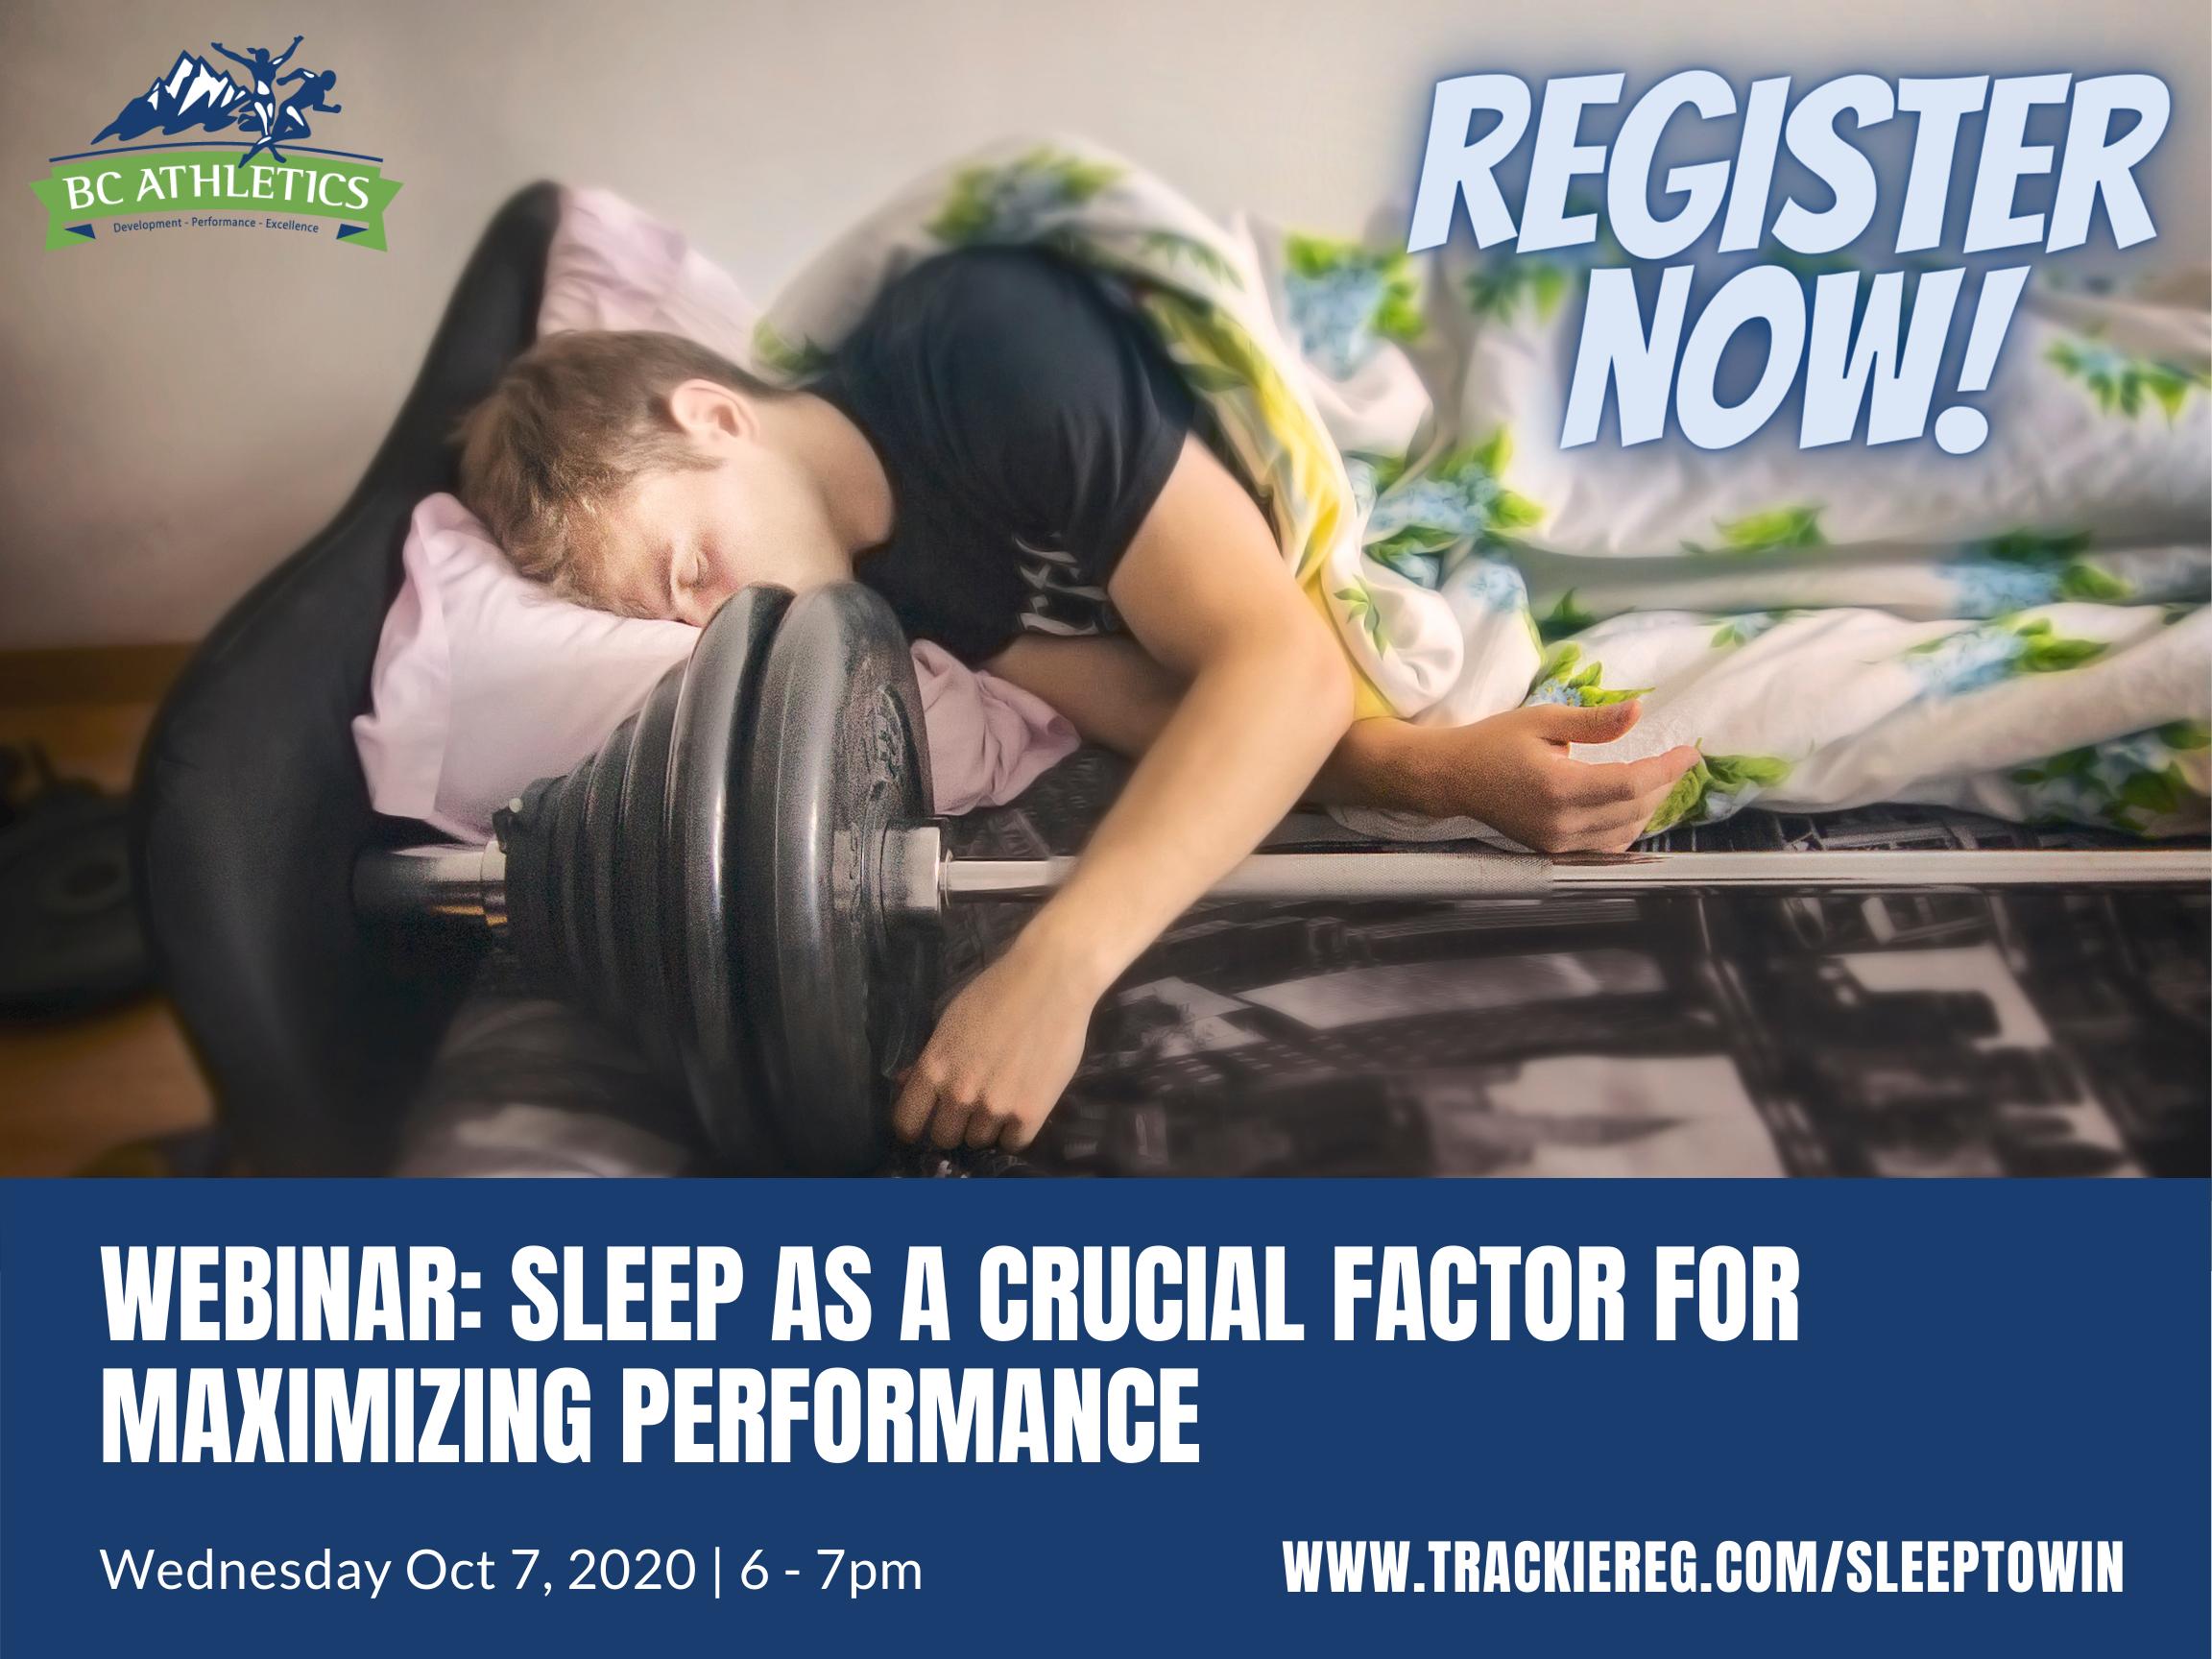 Sleep as A Crucial Factor for Maximizing Peak Performance